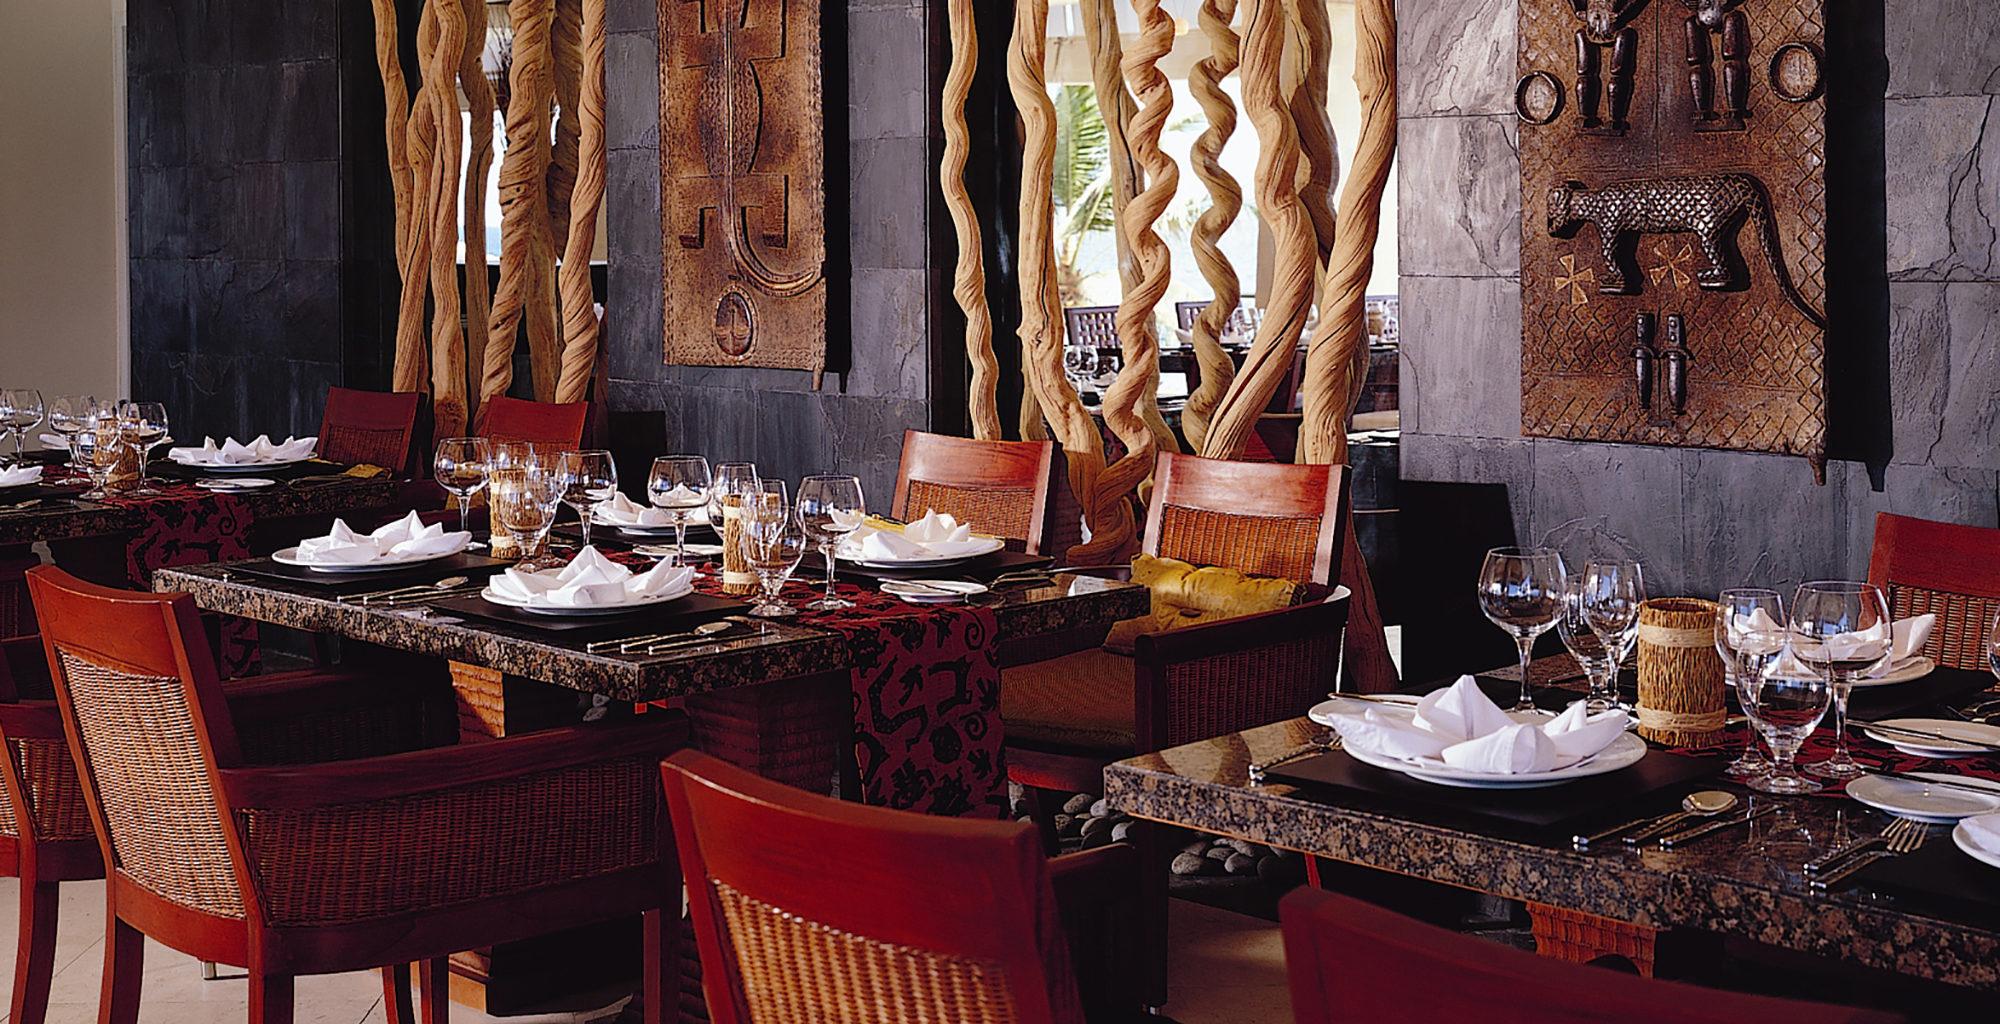 Seychelles-Banyan-Tree-Hotel-Dining-Interior